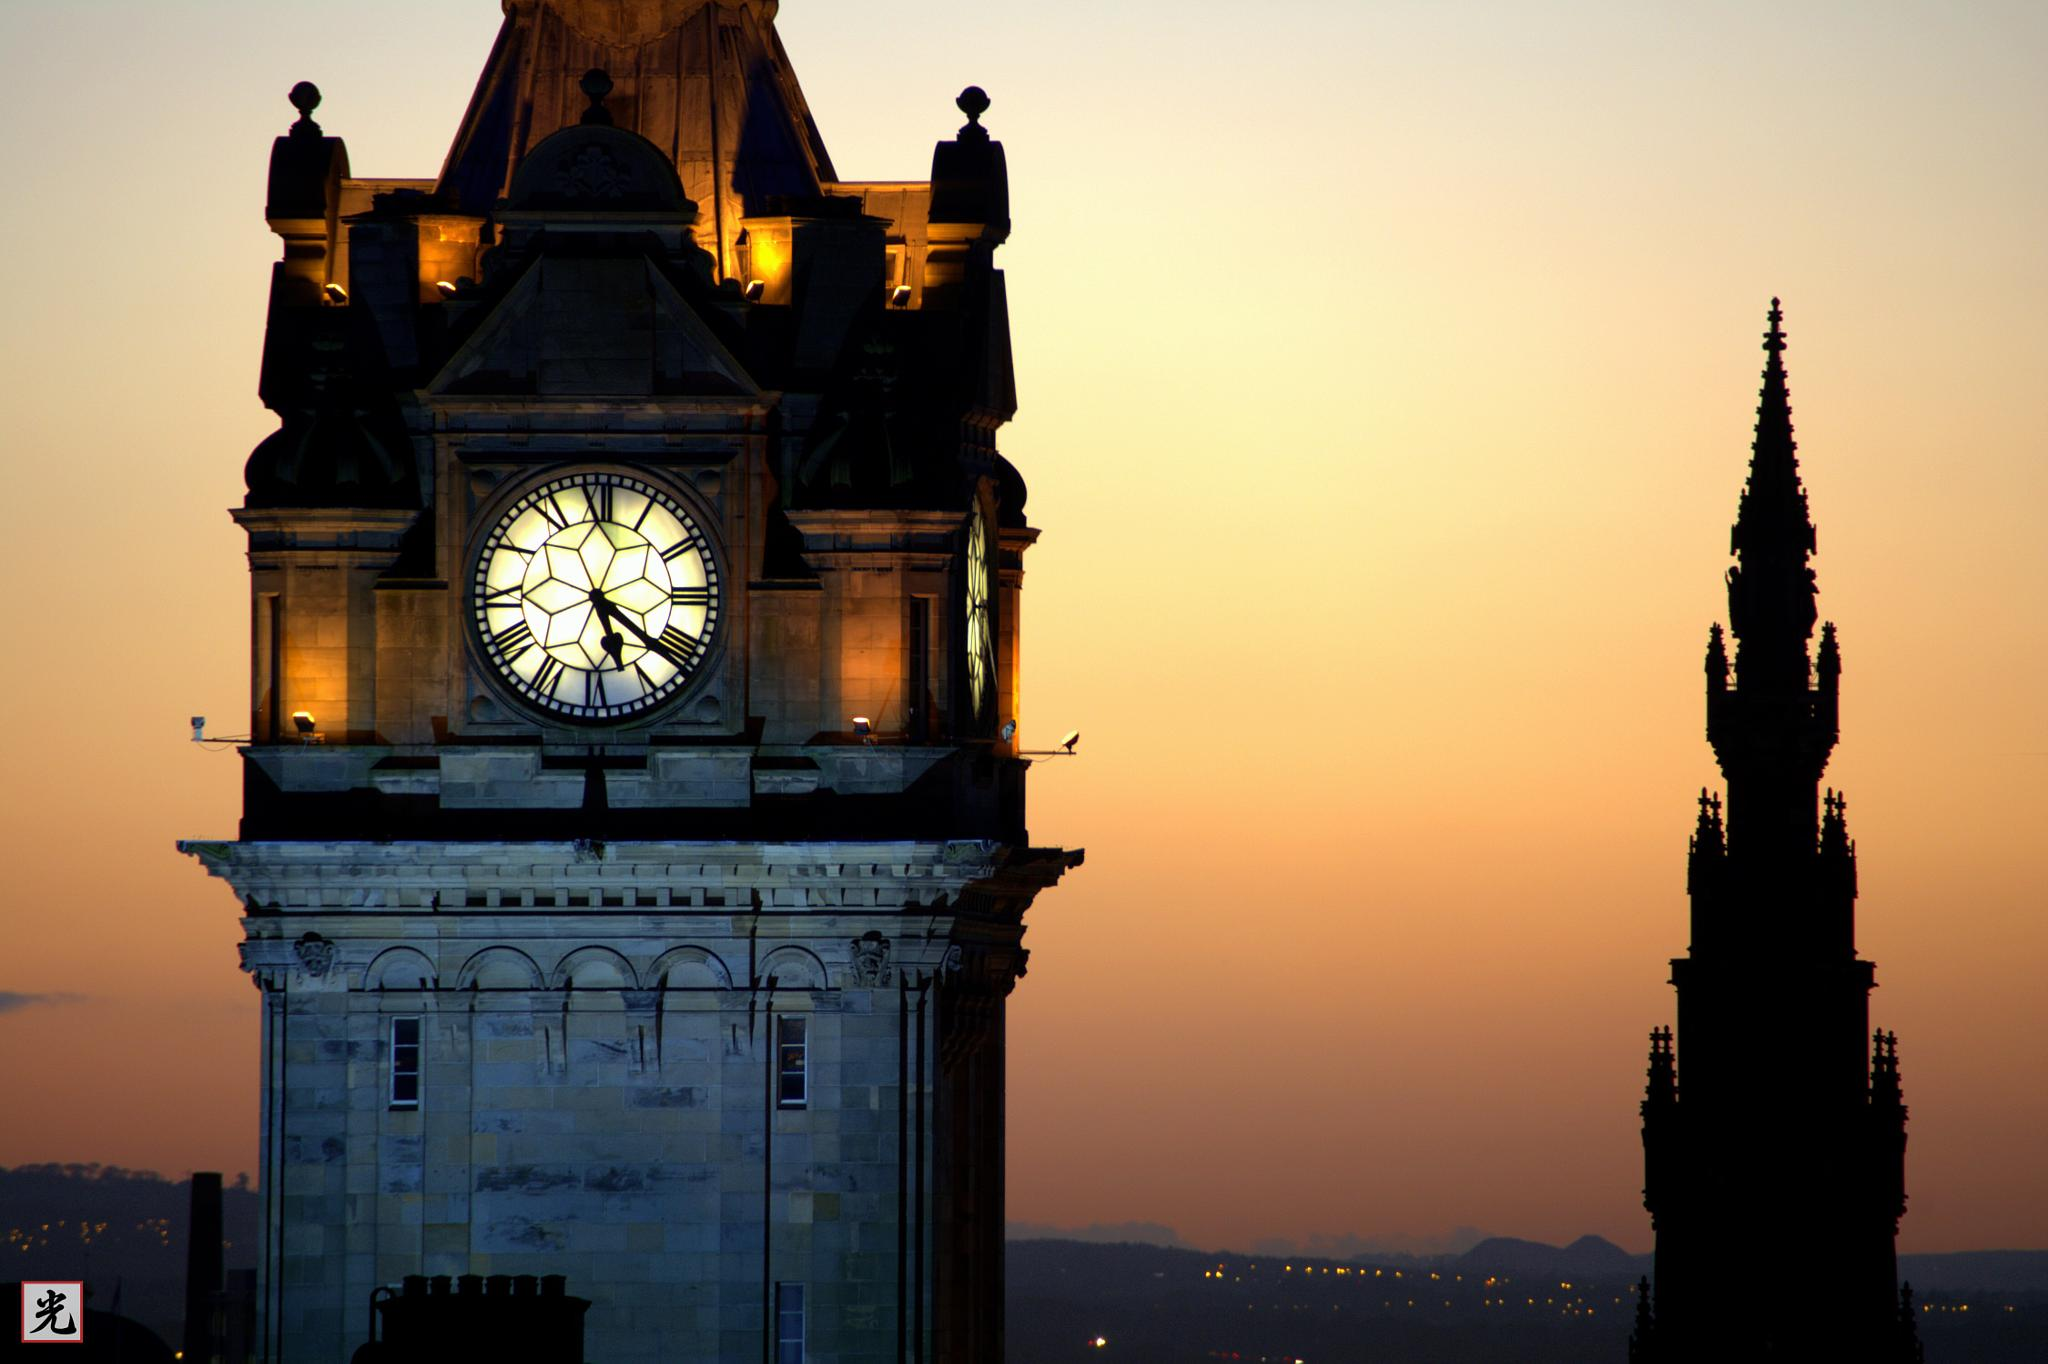 Balmoral Clock and Scott Monument by Jonathan Cruickshank